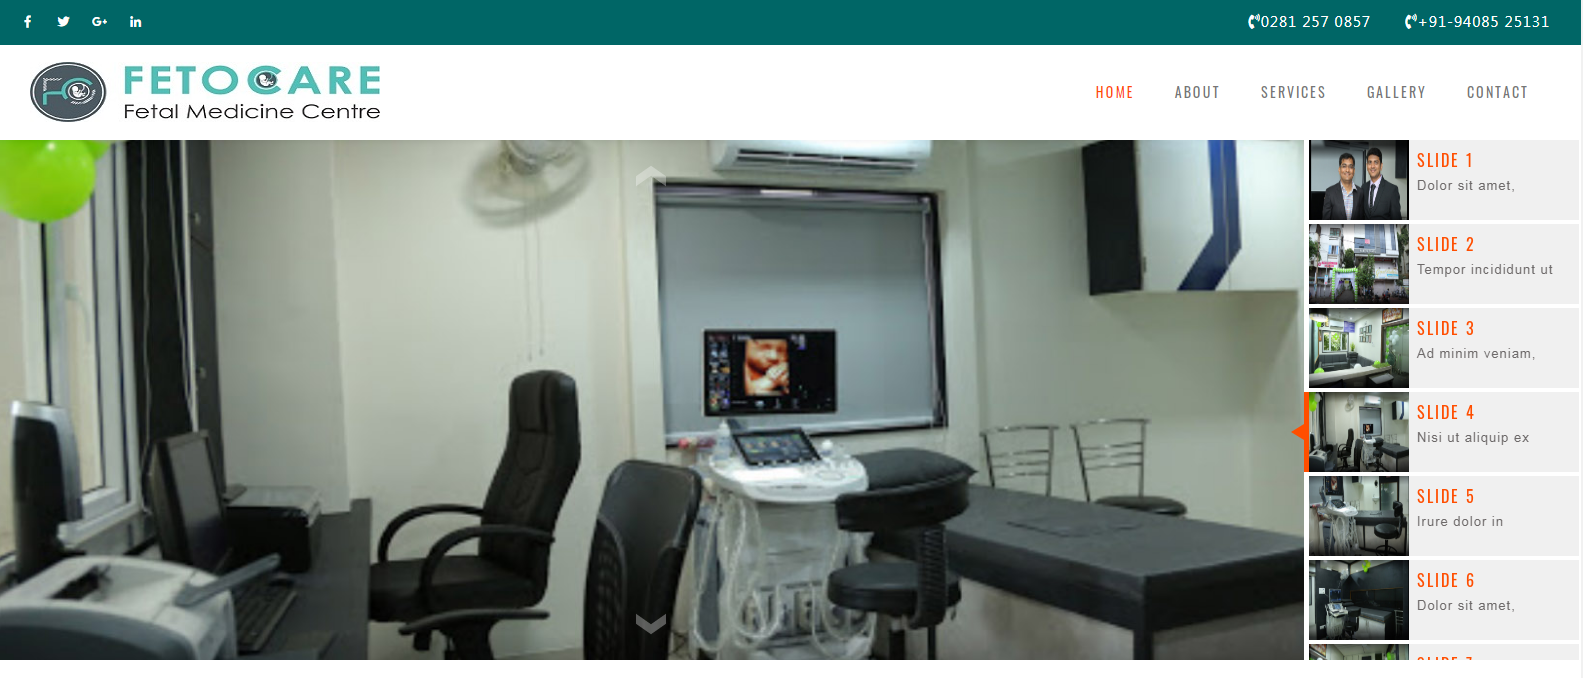 Fetocare Fetalmedicine Center